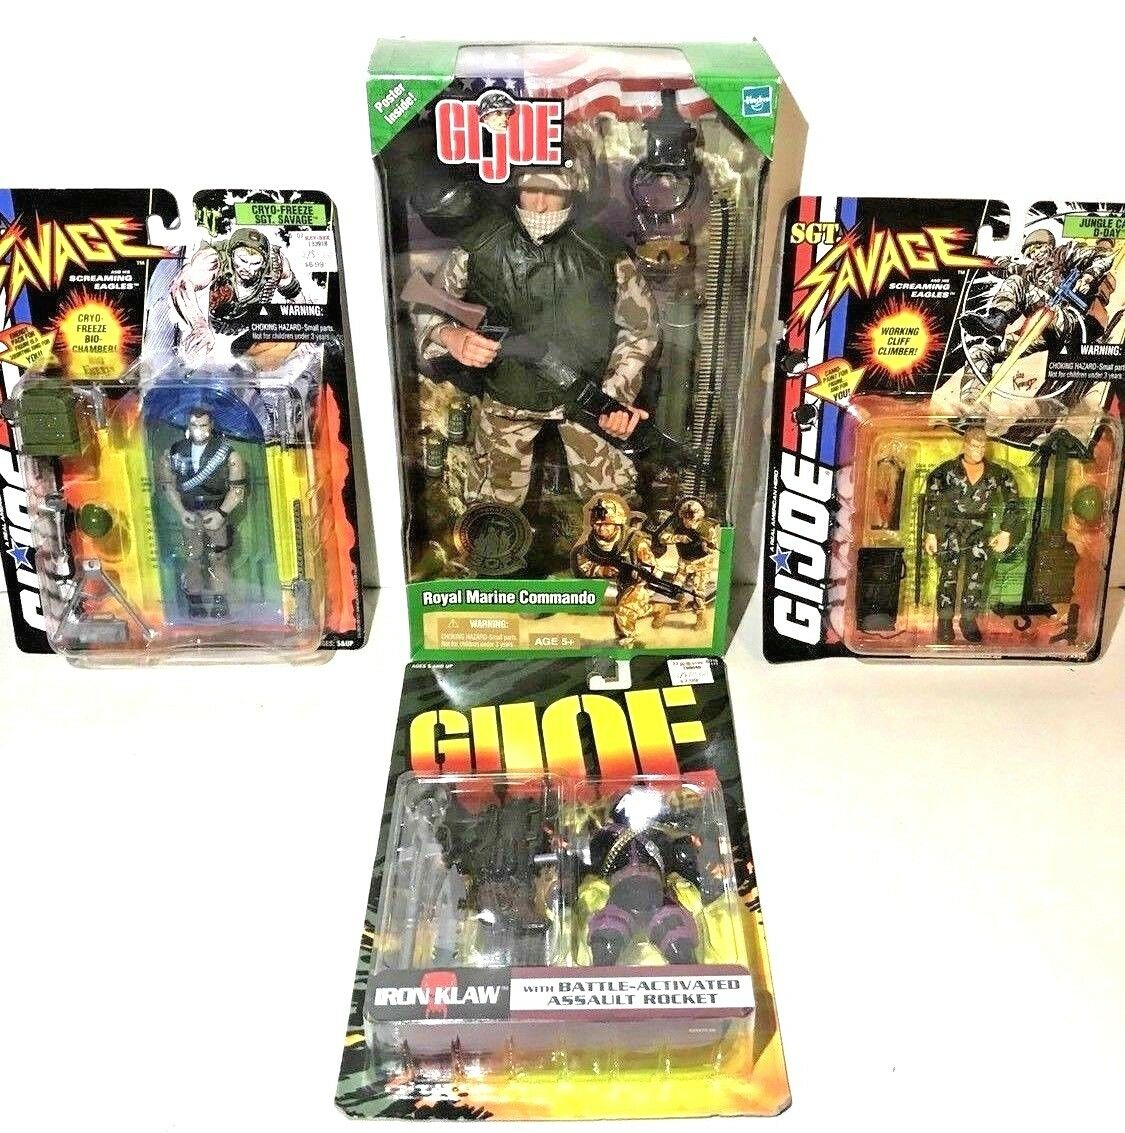 G.I. Joe Action Figure Lot of 4 Royal Marine Commando Sgt. Savage Iron Claw MOC